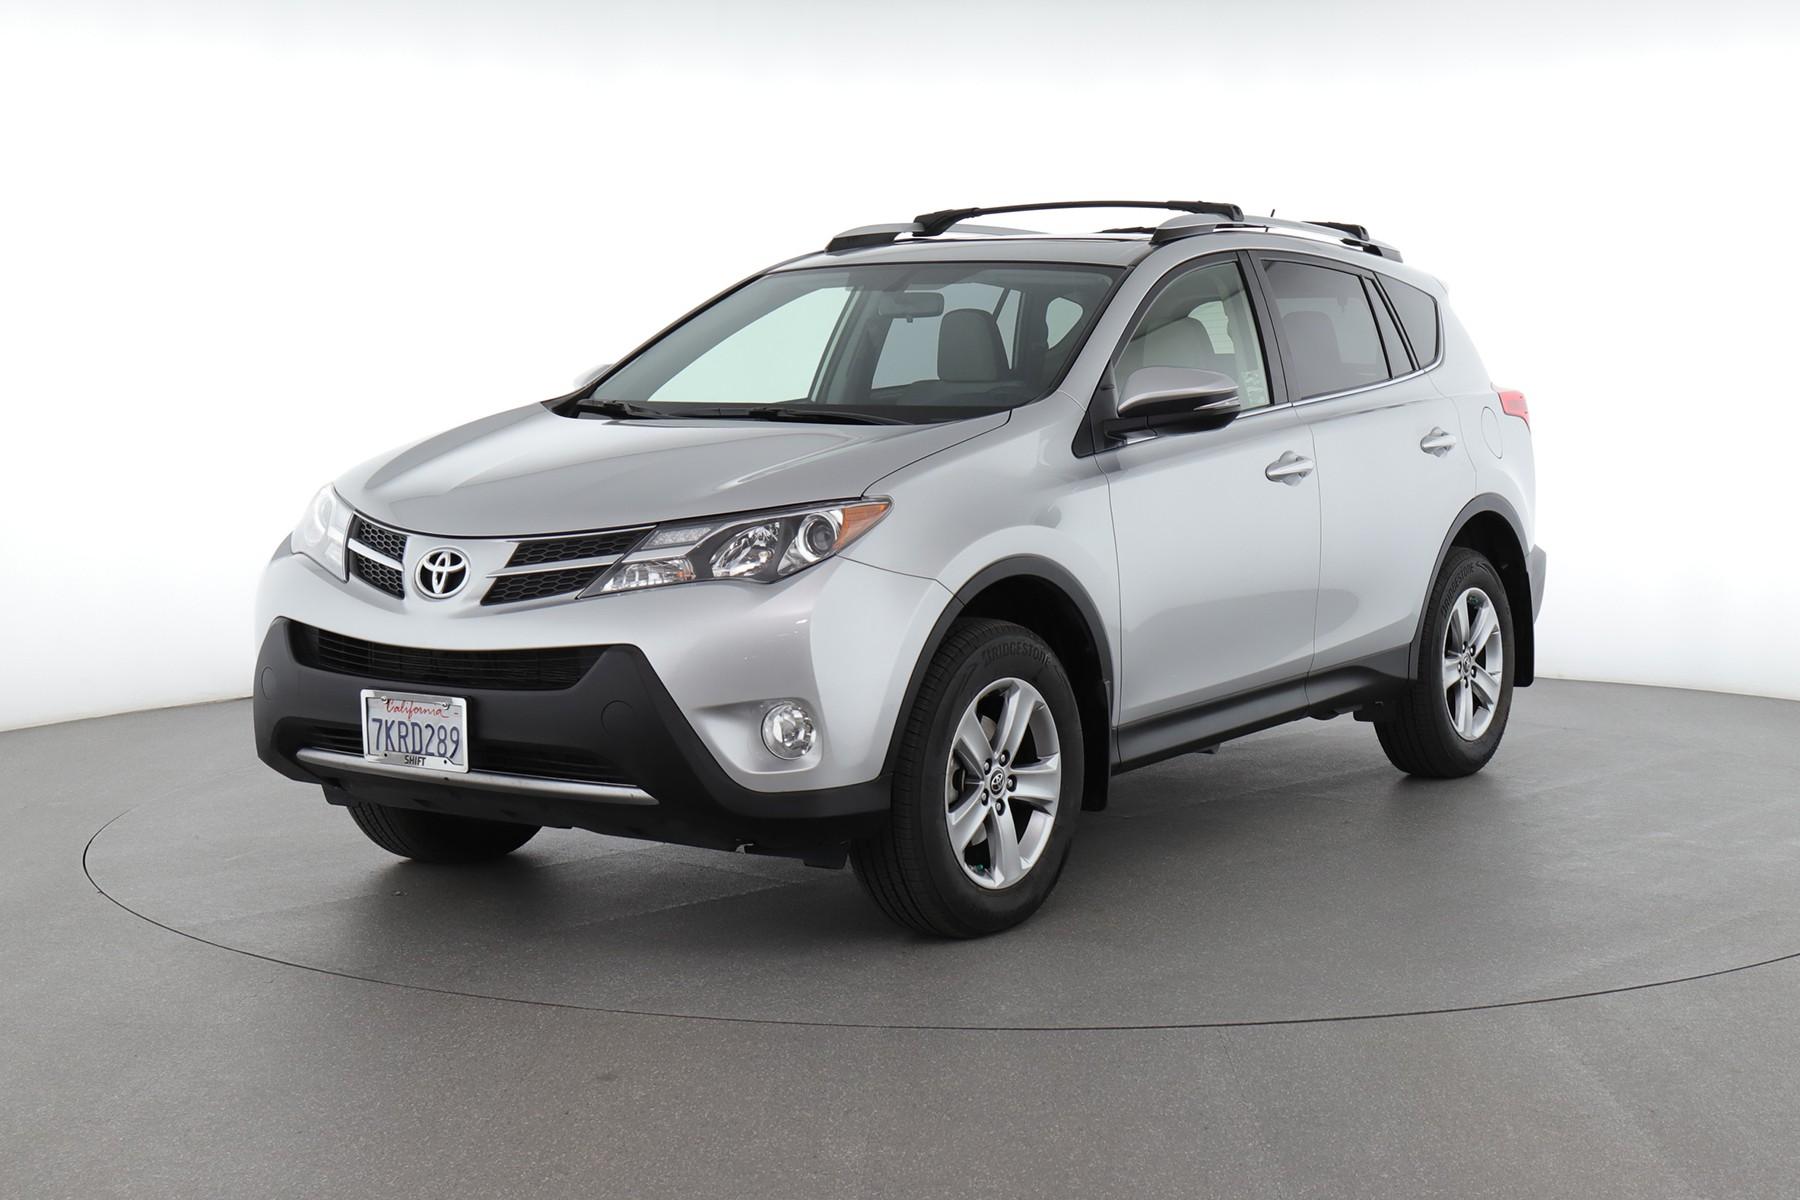 2015 Toyota RAV4 XLE (from $21,950)